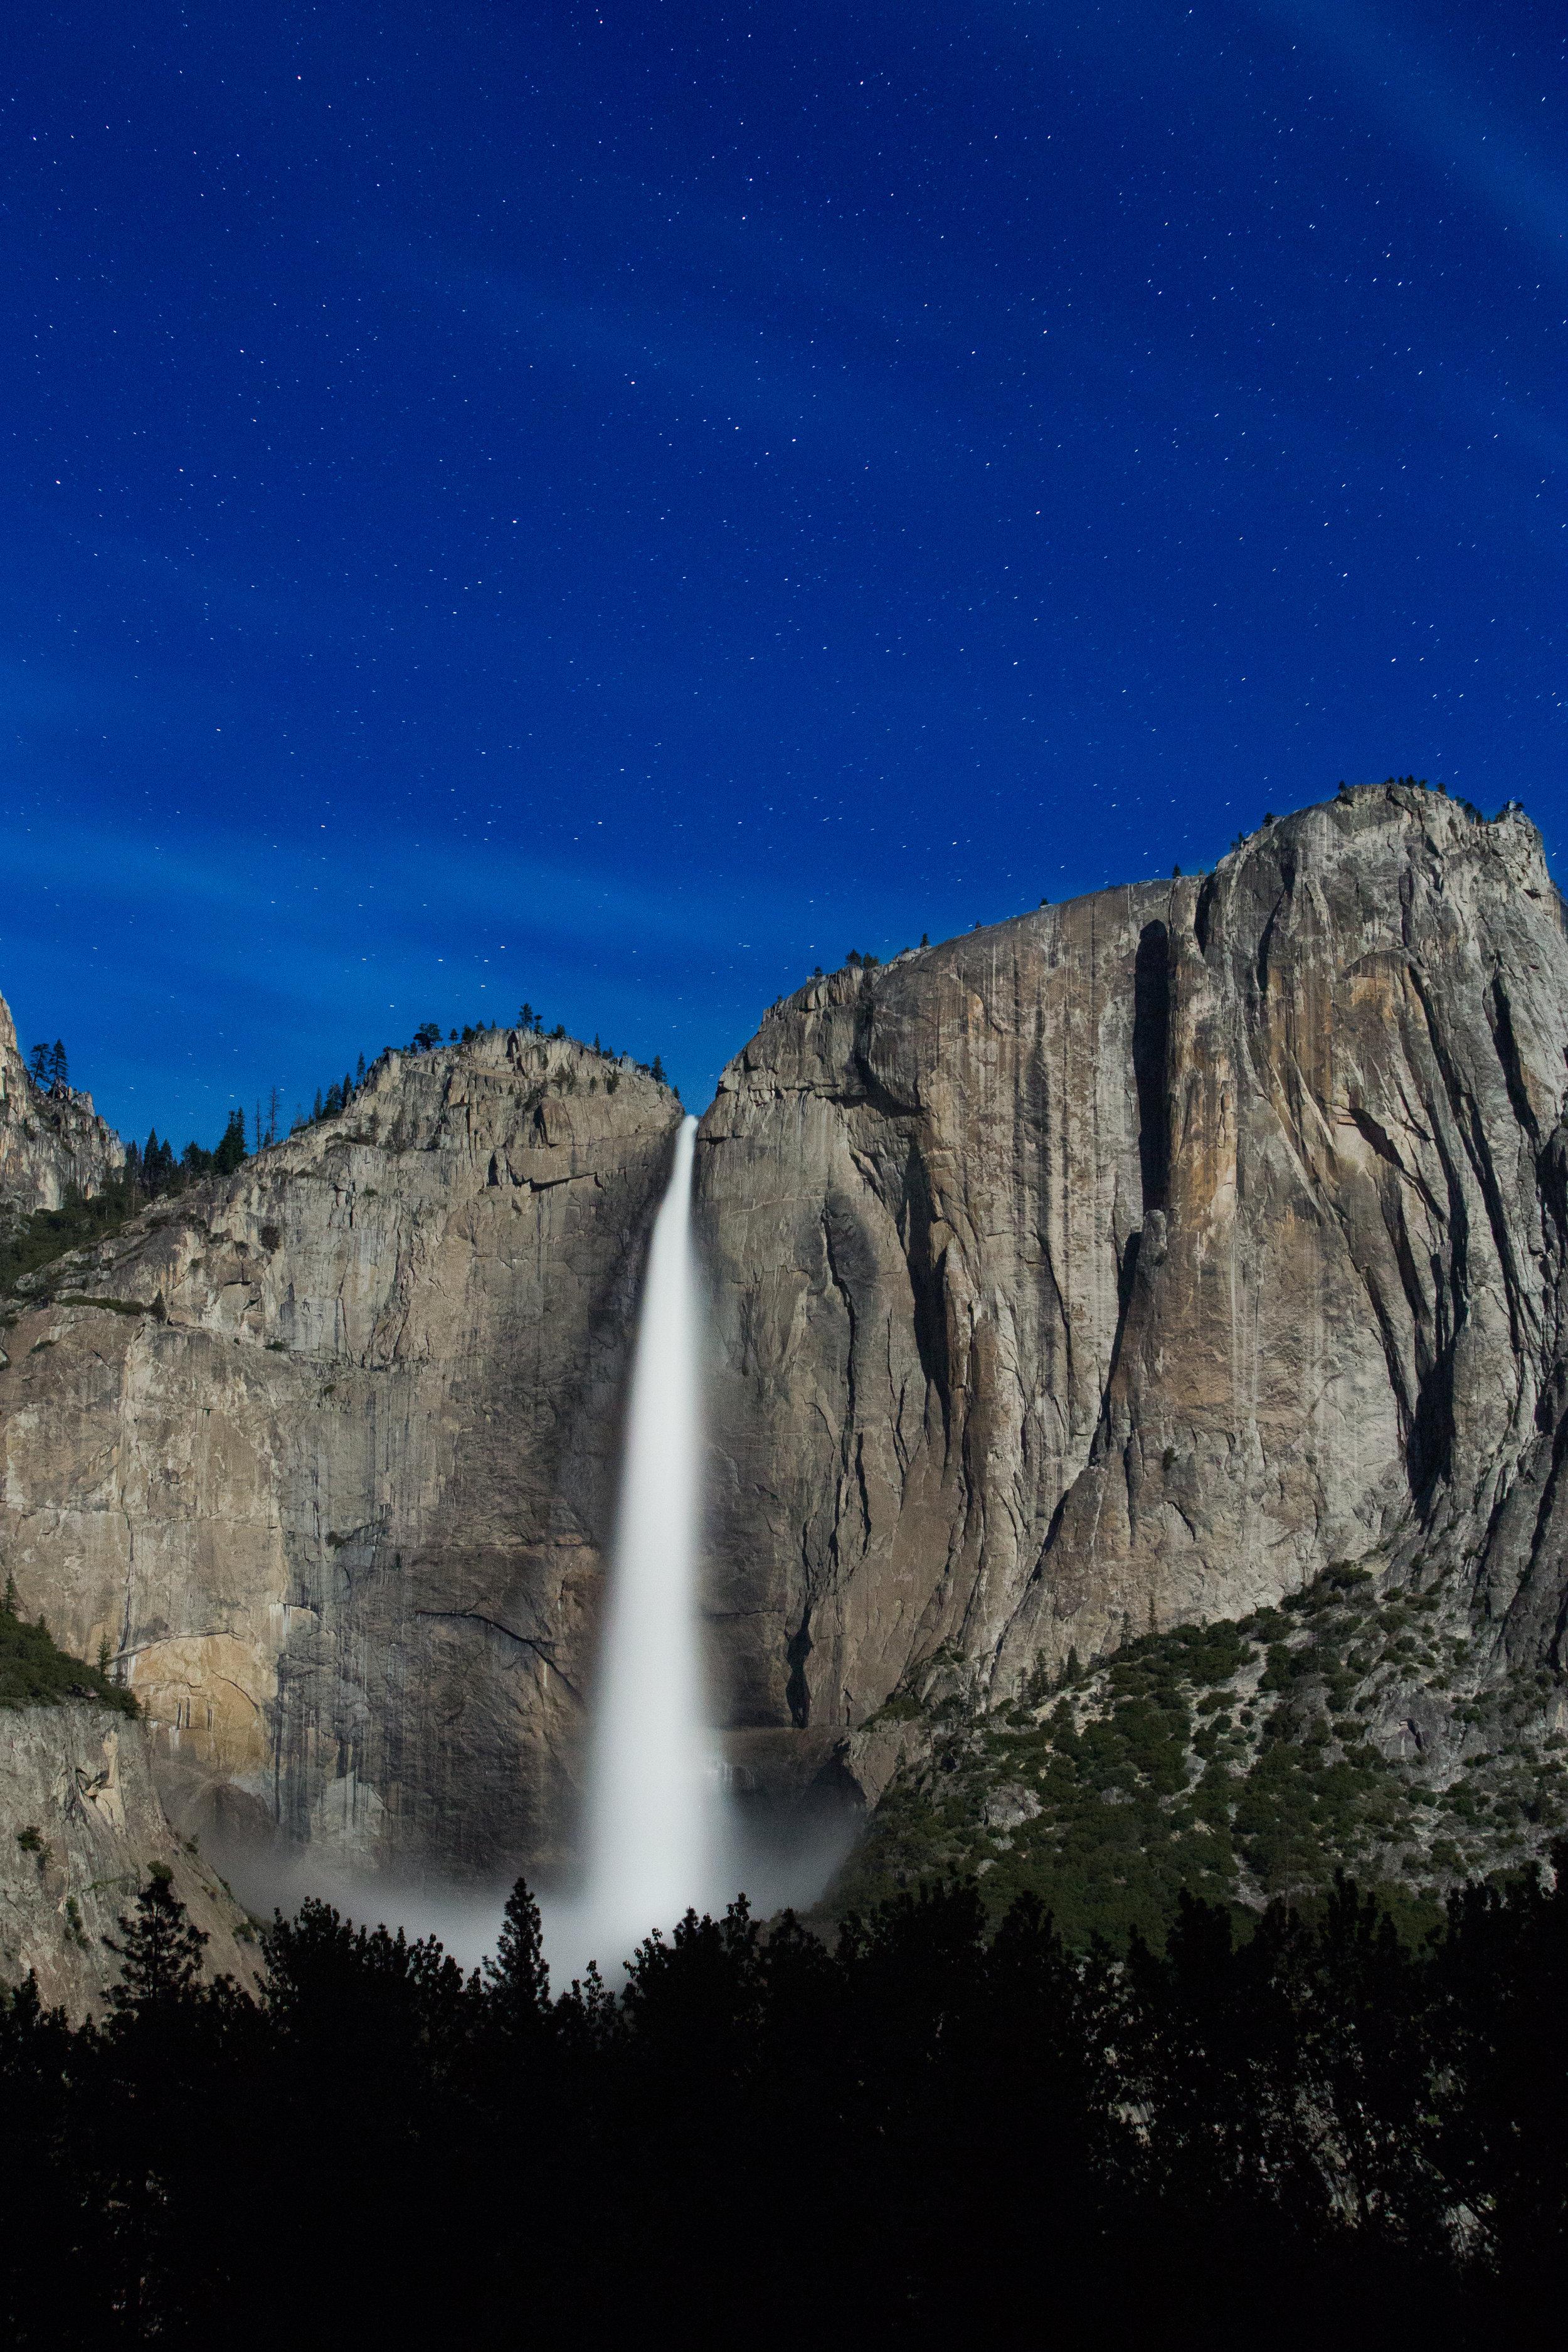 Upper Yosemite Falls 3 a.m.   Davis Gerber Works